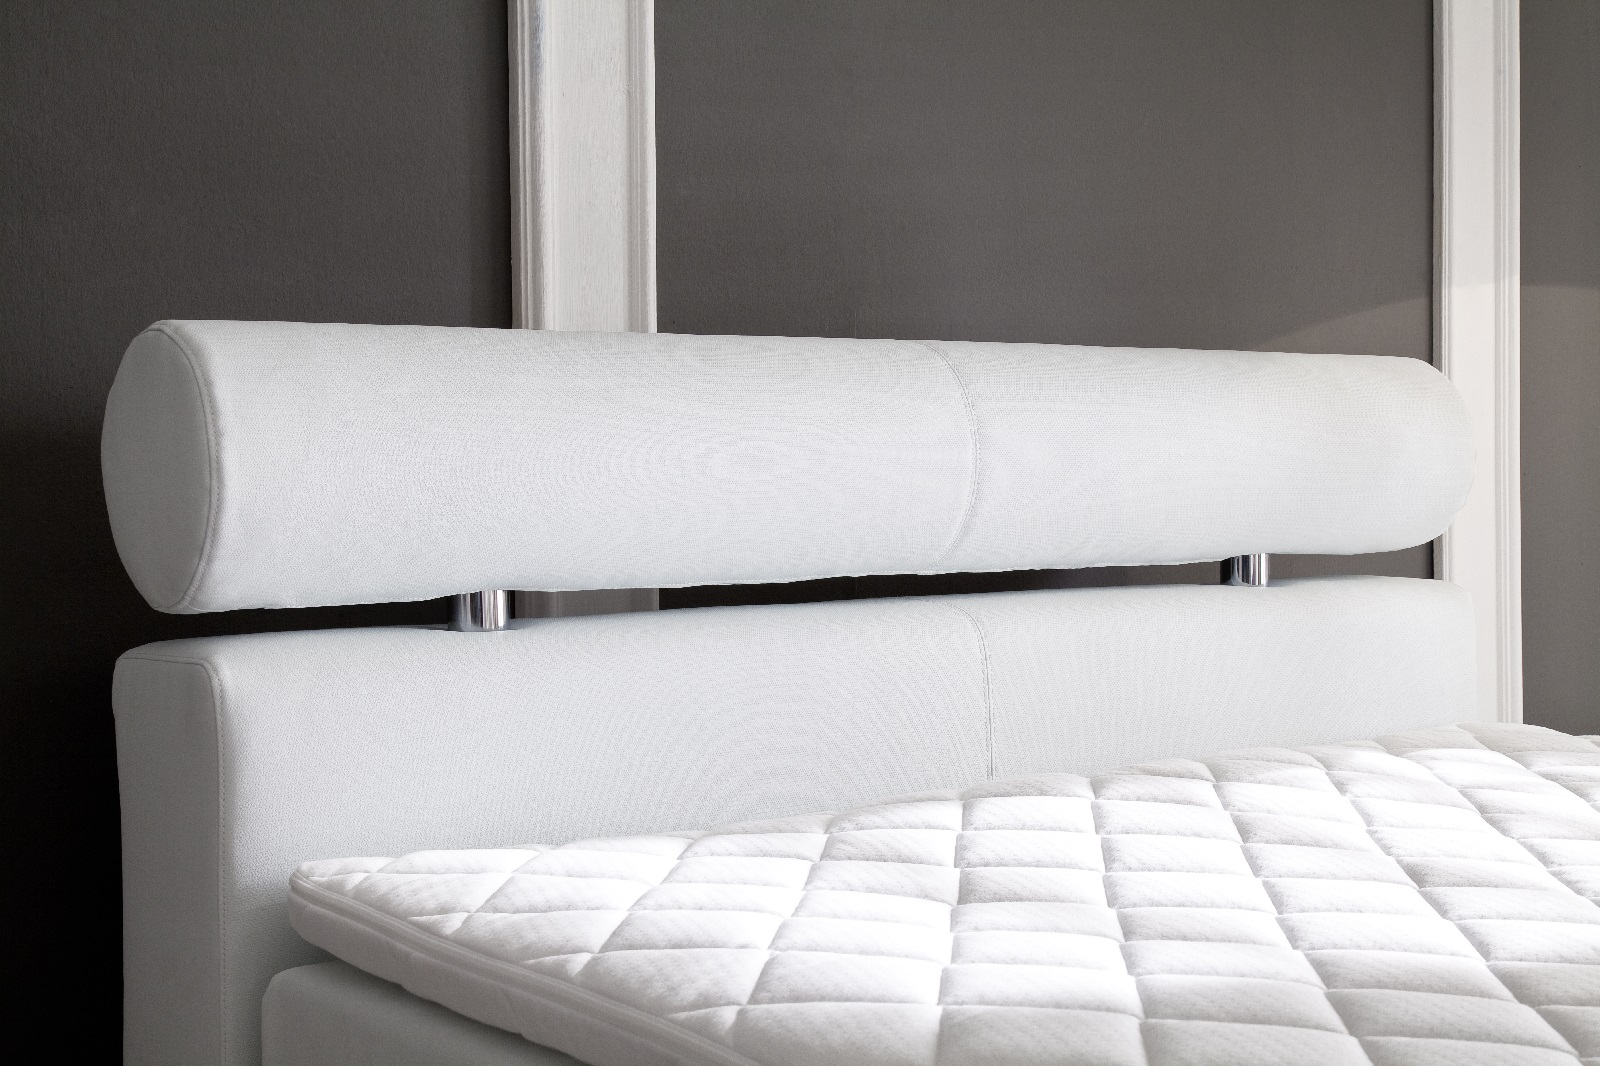 boxspringbett weiss leder ihr traumhaus ideen. Black Bedroom Furniture Sets. Home Design Ideas